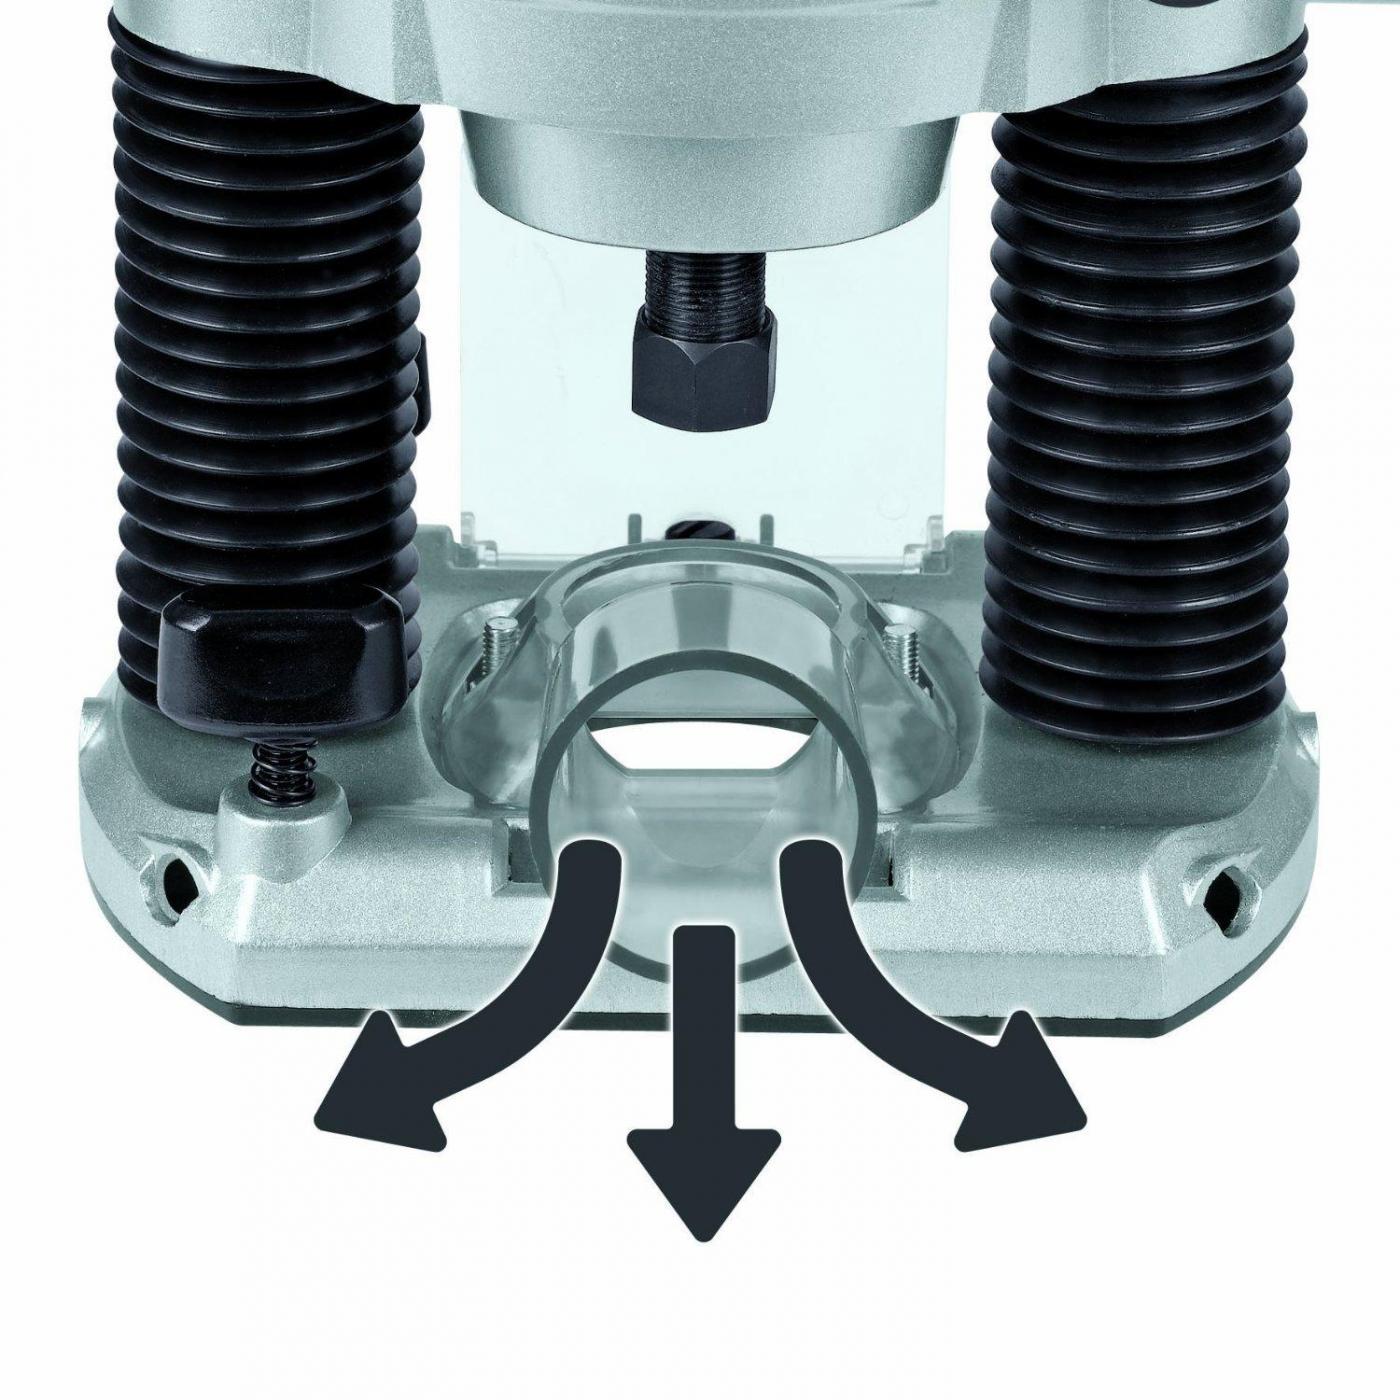 Fresatrici: EINHELL Fresatrice verticale TH RO 11E in offerta